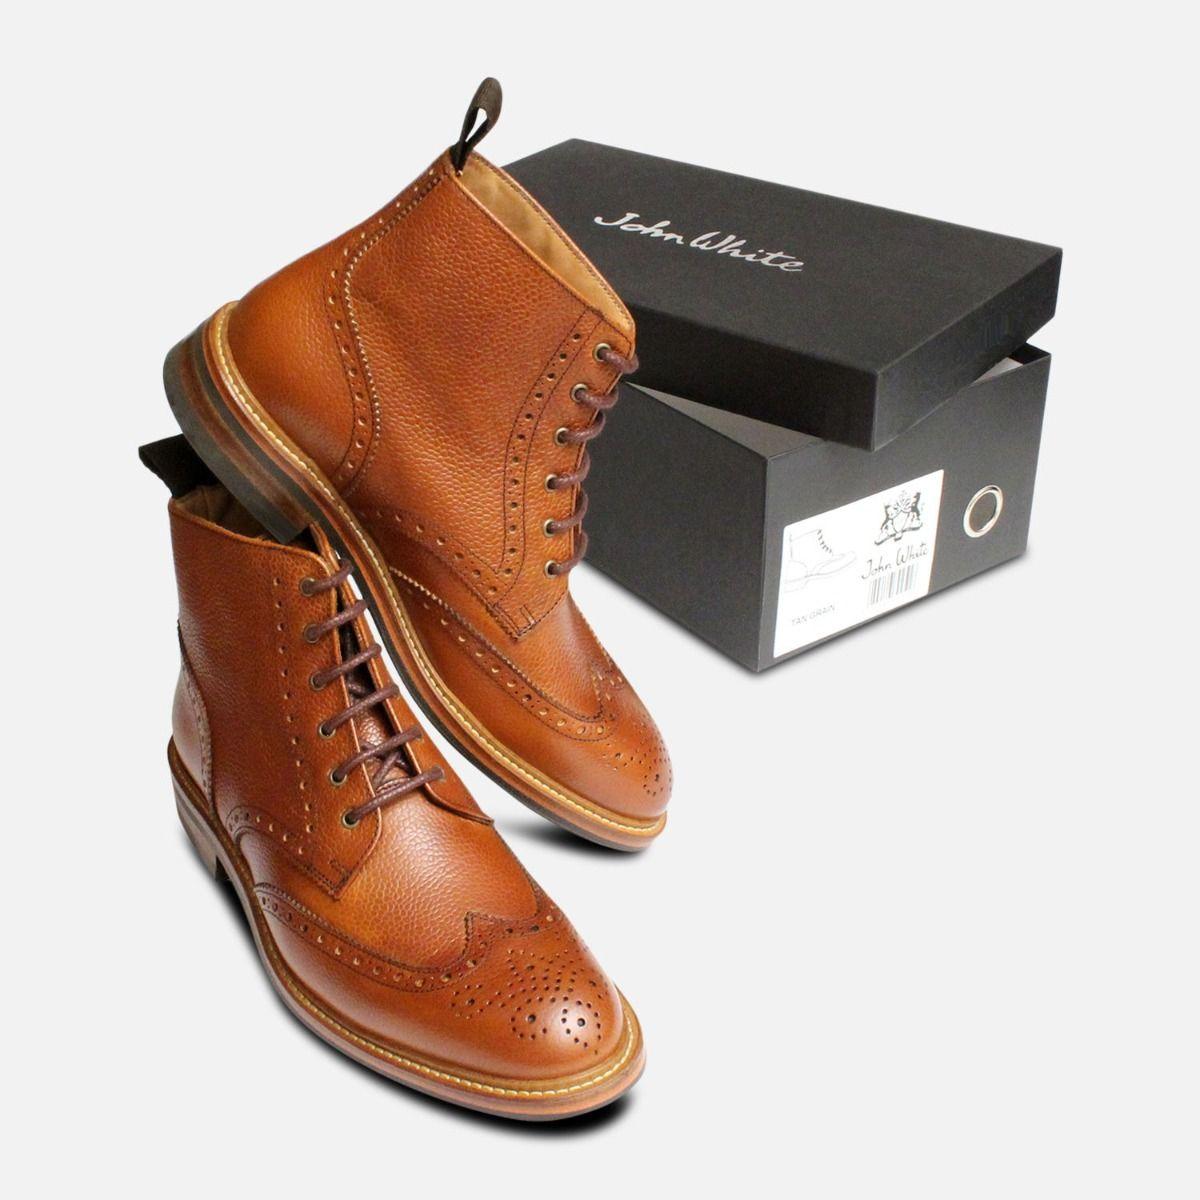 John White Country Brogue Boots in Tan Grain